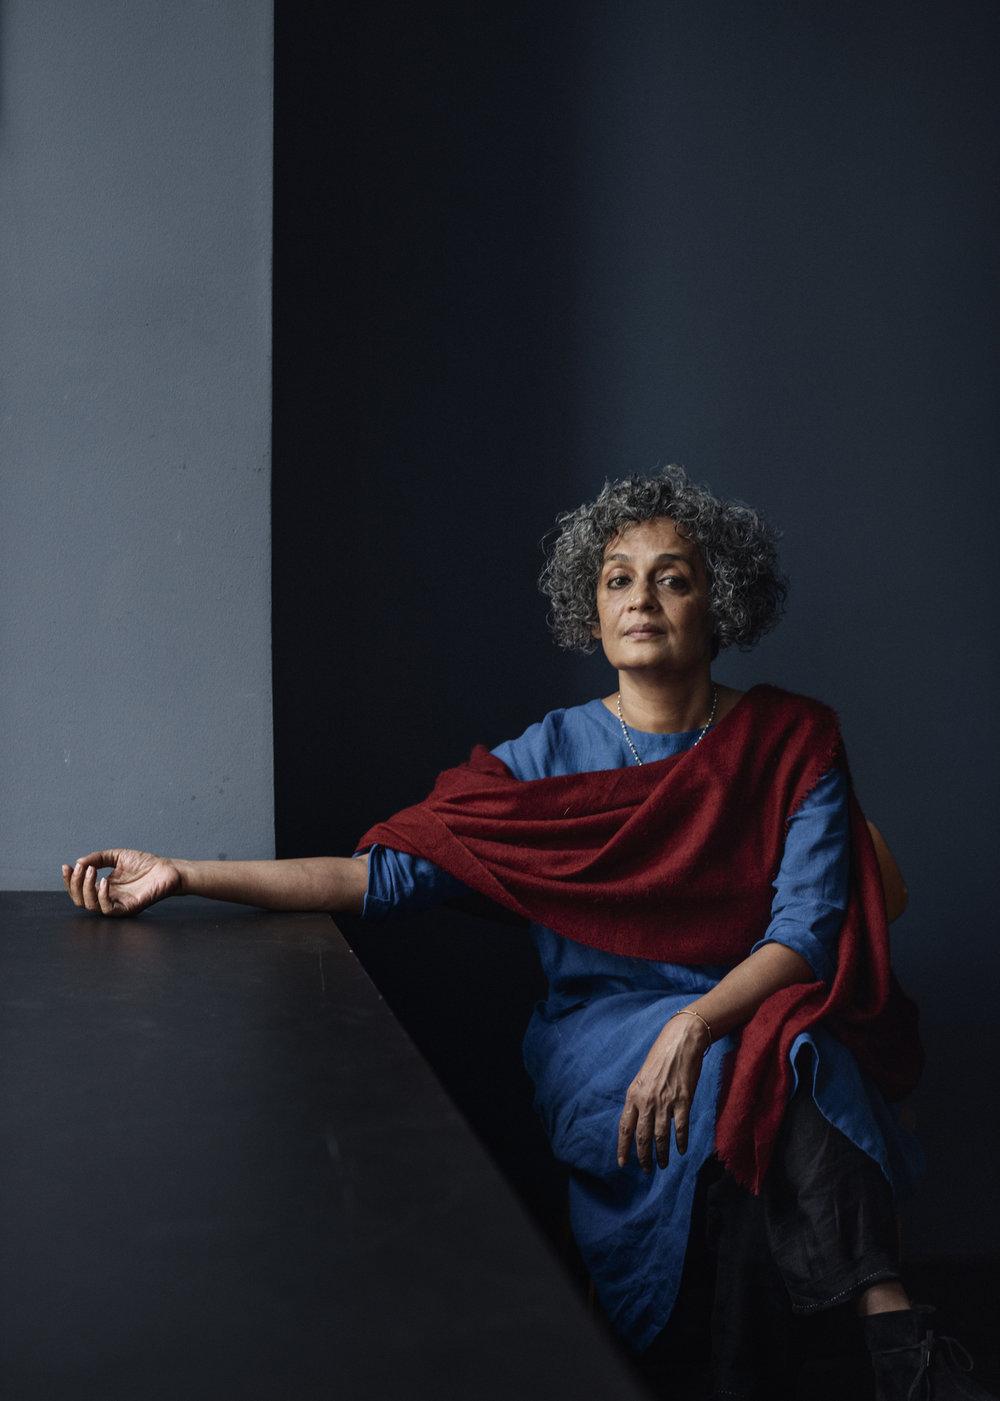 Author Arundhati Roy, Morgenbladet 2017.